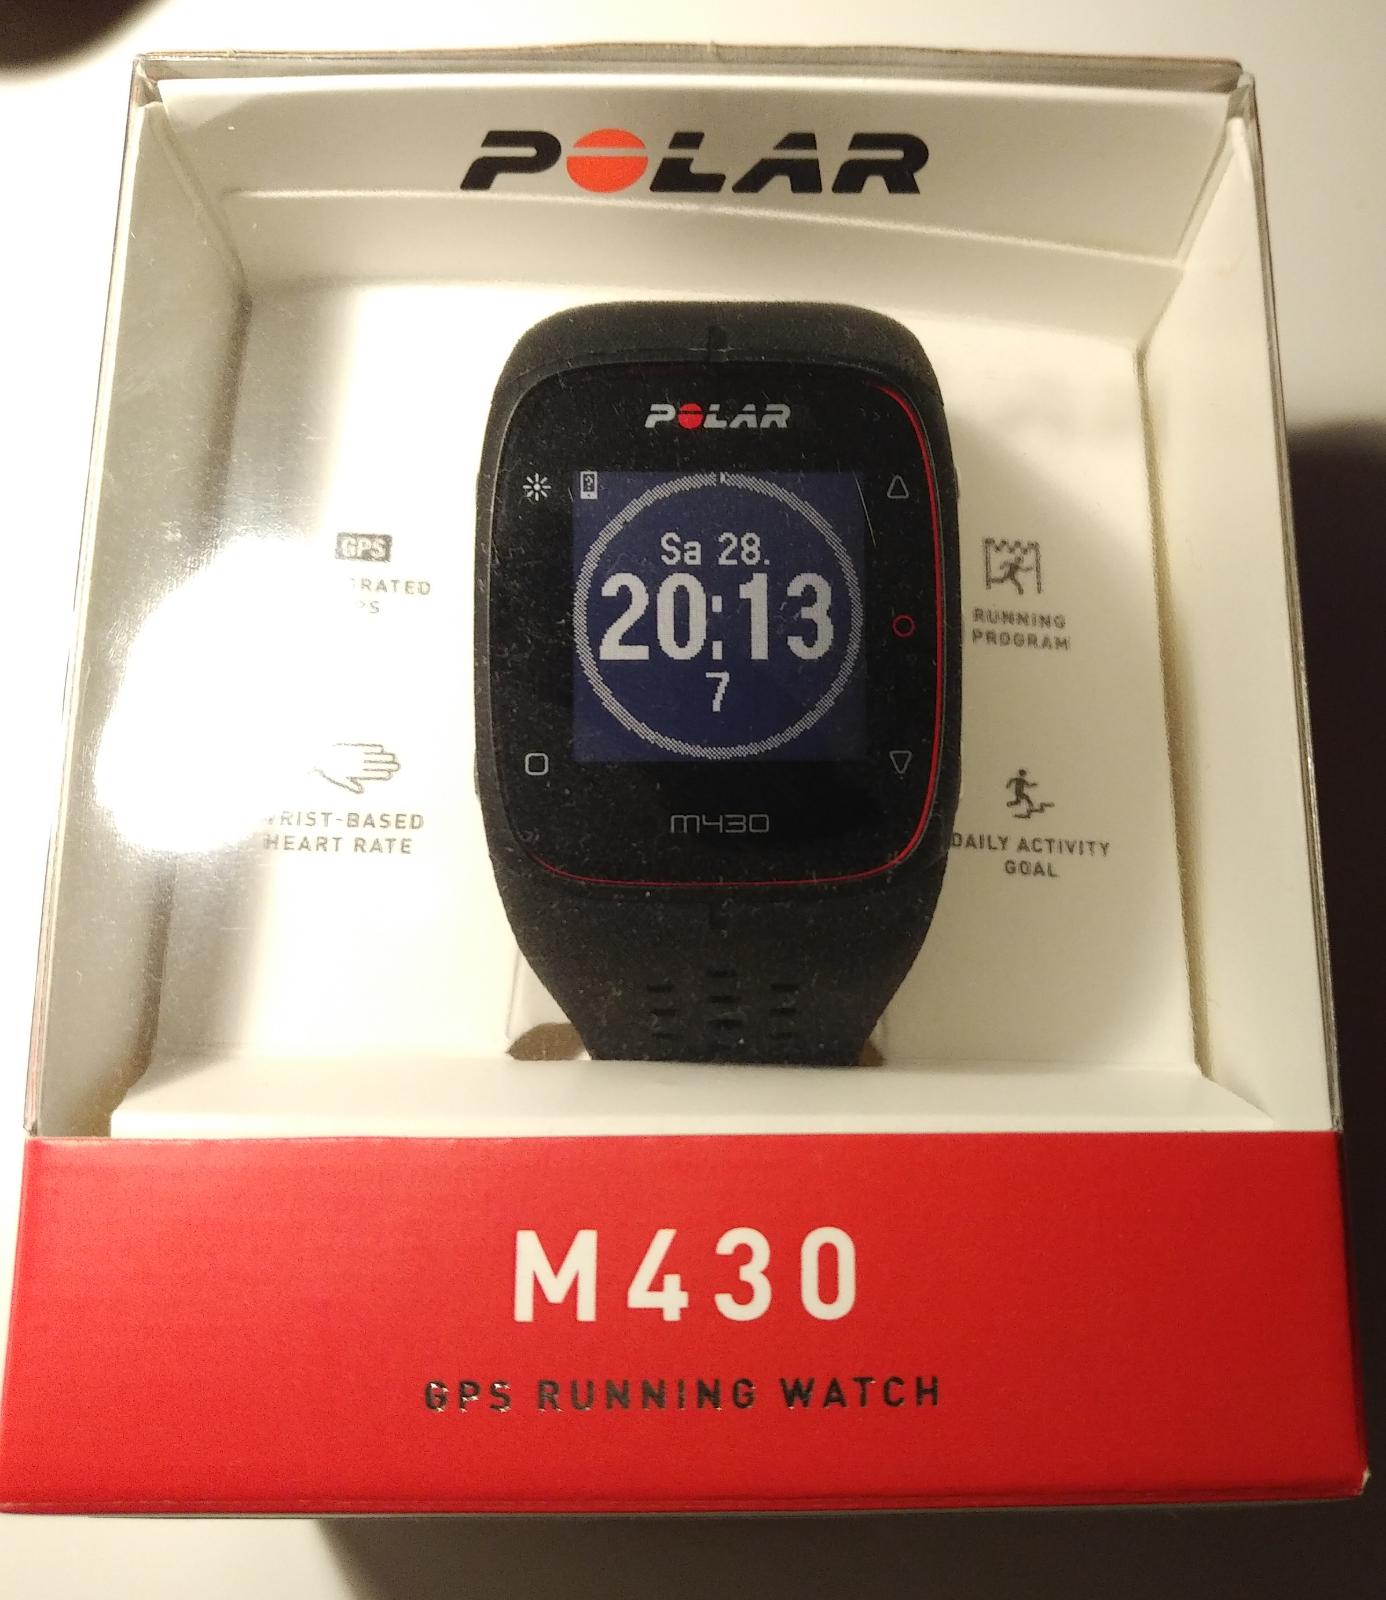 Polar M430 GPS Running Watch, in Originalverpackung!